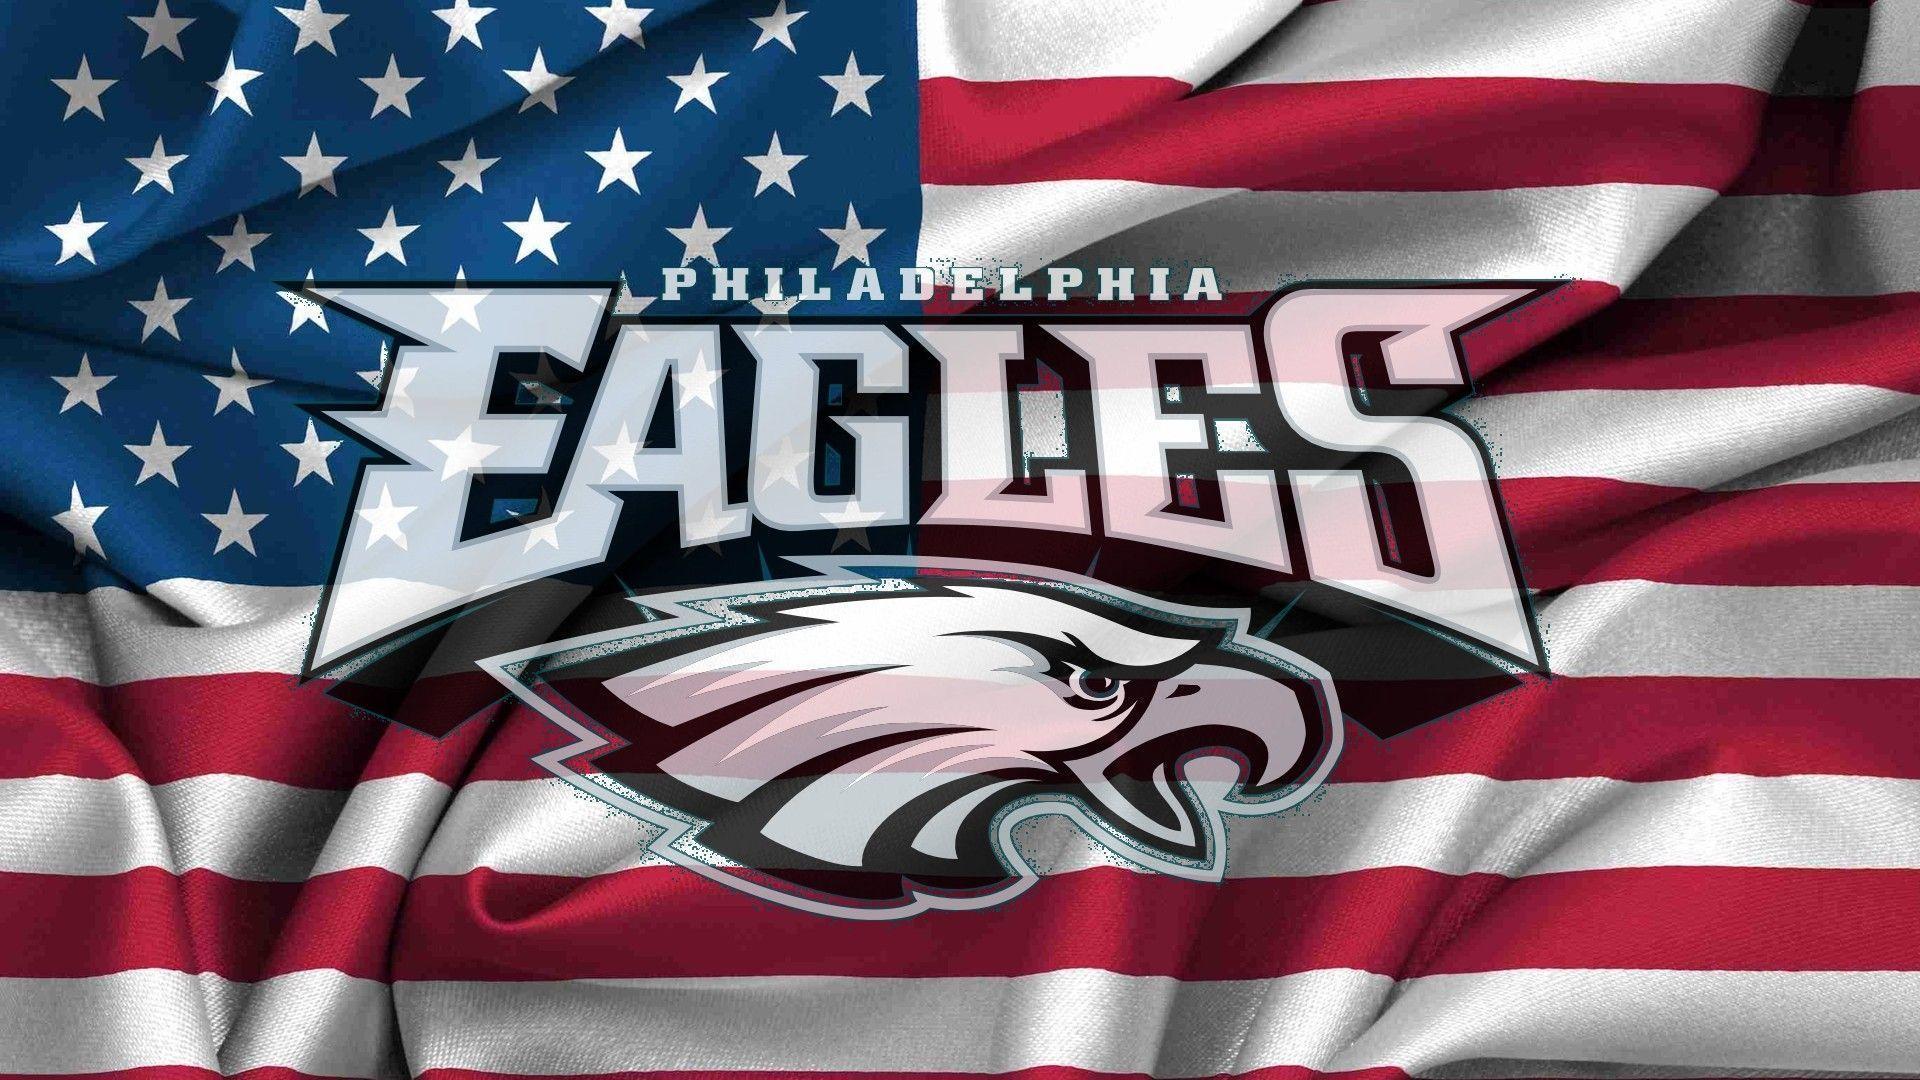 philadelphia eagles 2016 schedule wallpapers wallpaper cave